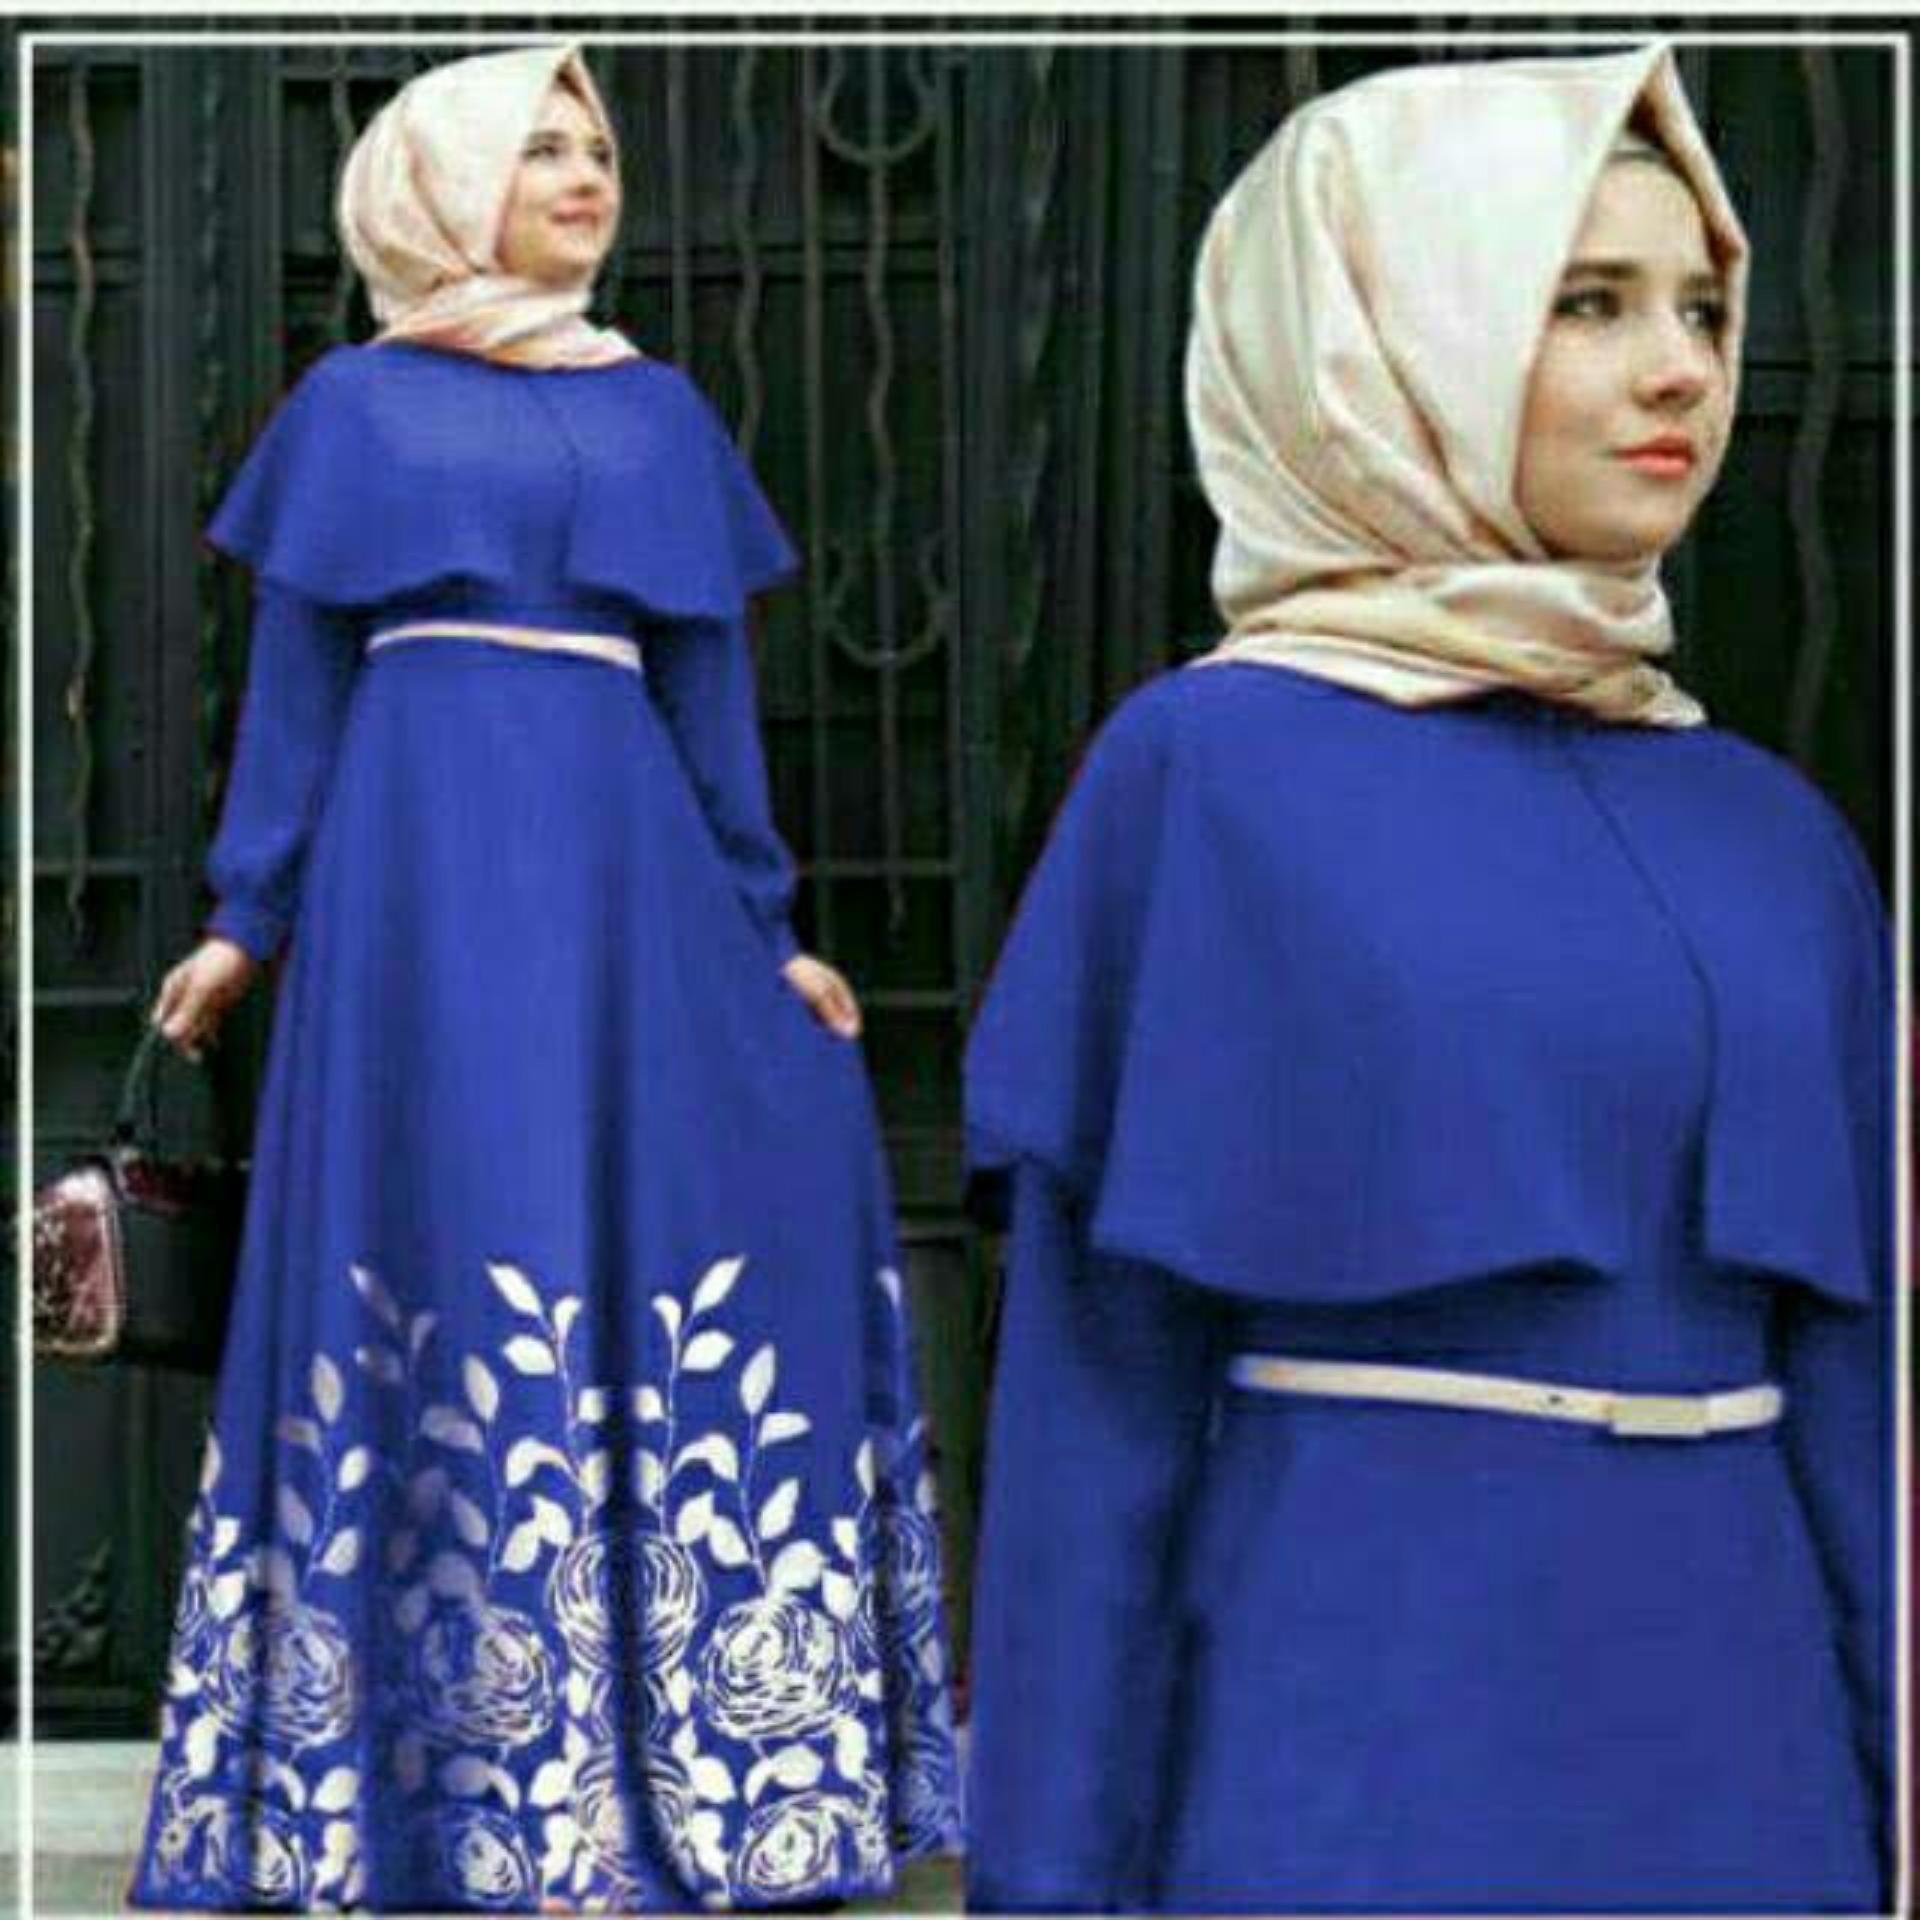 TOTO - Baju SETELAN atasan dan bawahan / Setelan Blouse/ Kemeja wanita / Long Dress Maxy / Long Dress Wanita / Gaun Panjang/Gaun Wanita / Tunik Wanita / Dress Muslim / Atasan Muslim / Gamis ; Murah; Motif dan Warna Real Photo #Ukuran M, L dan XL